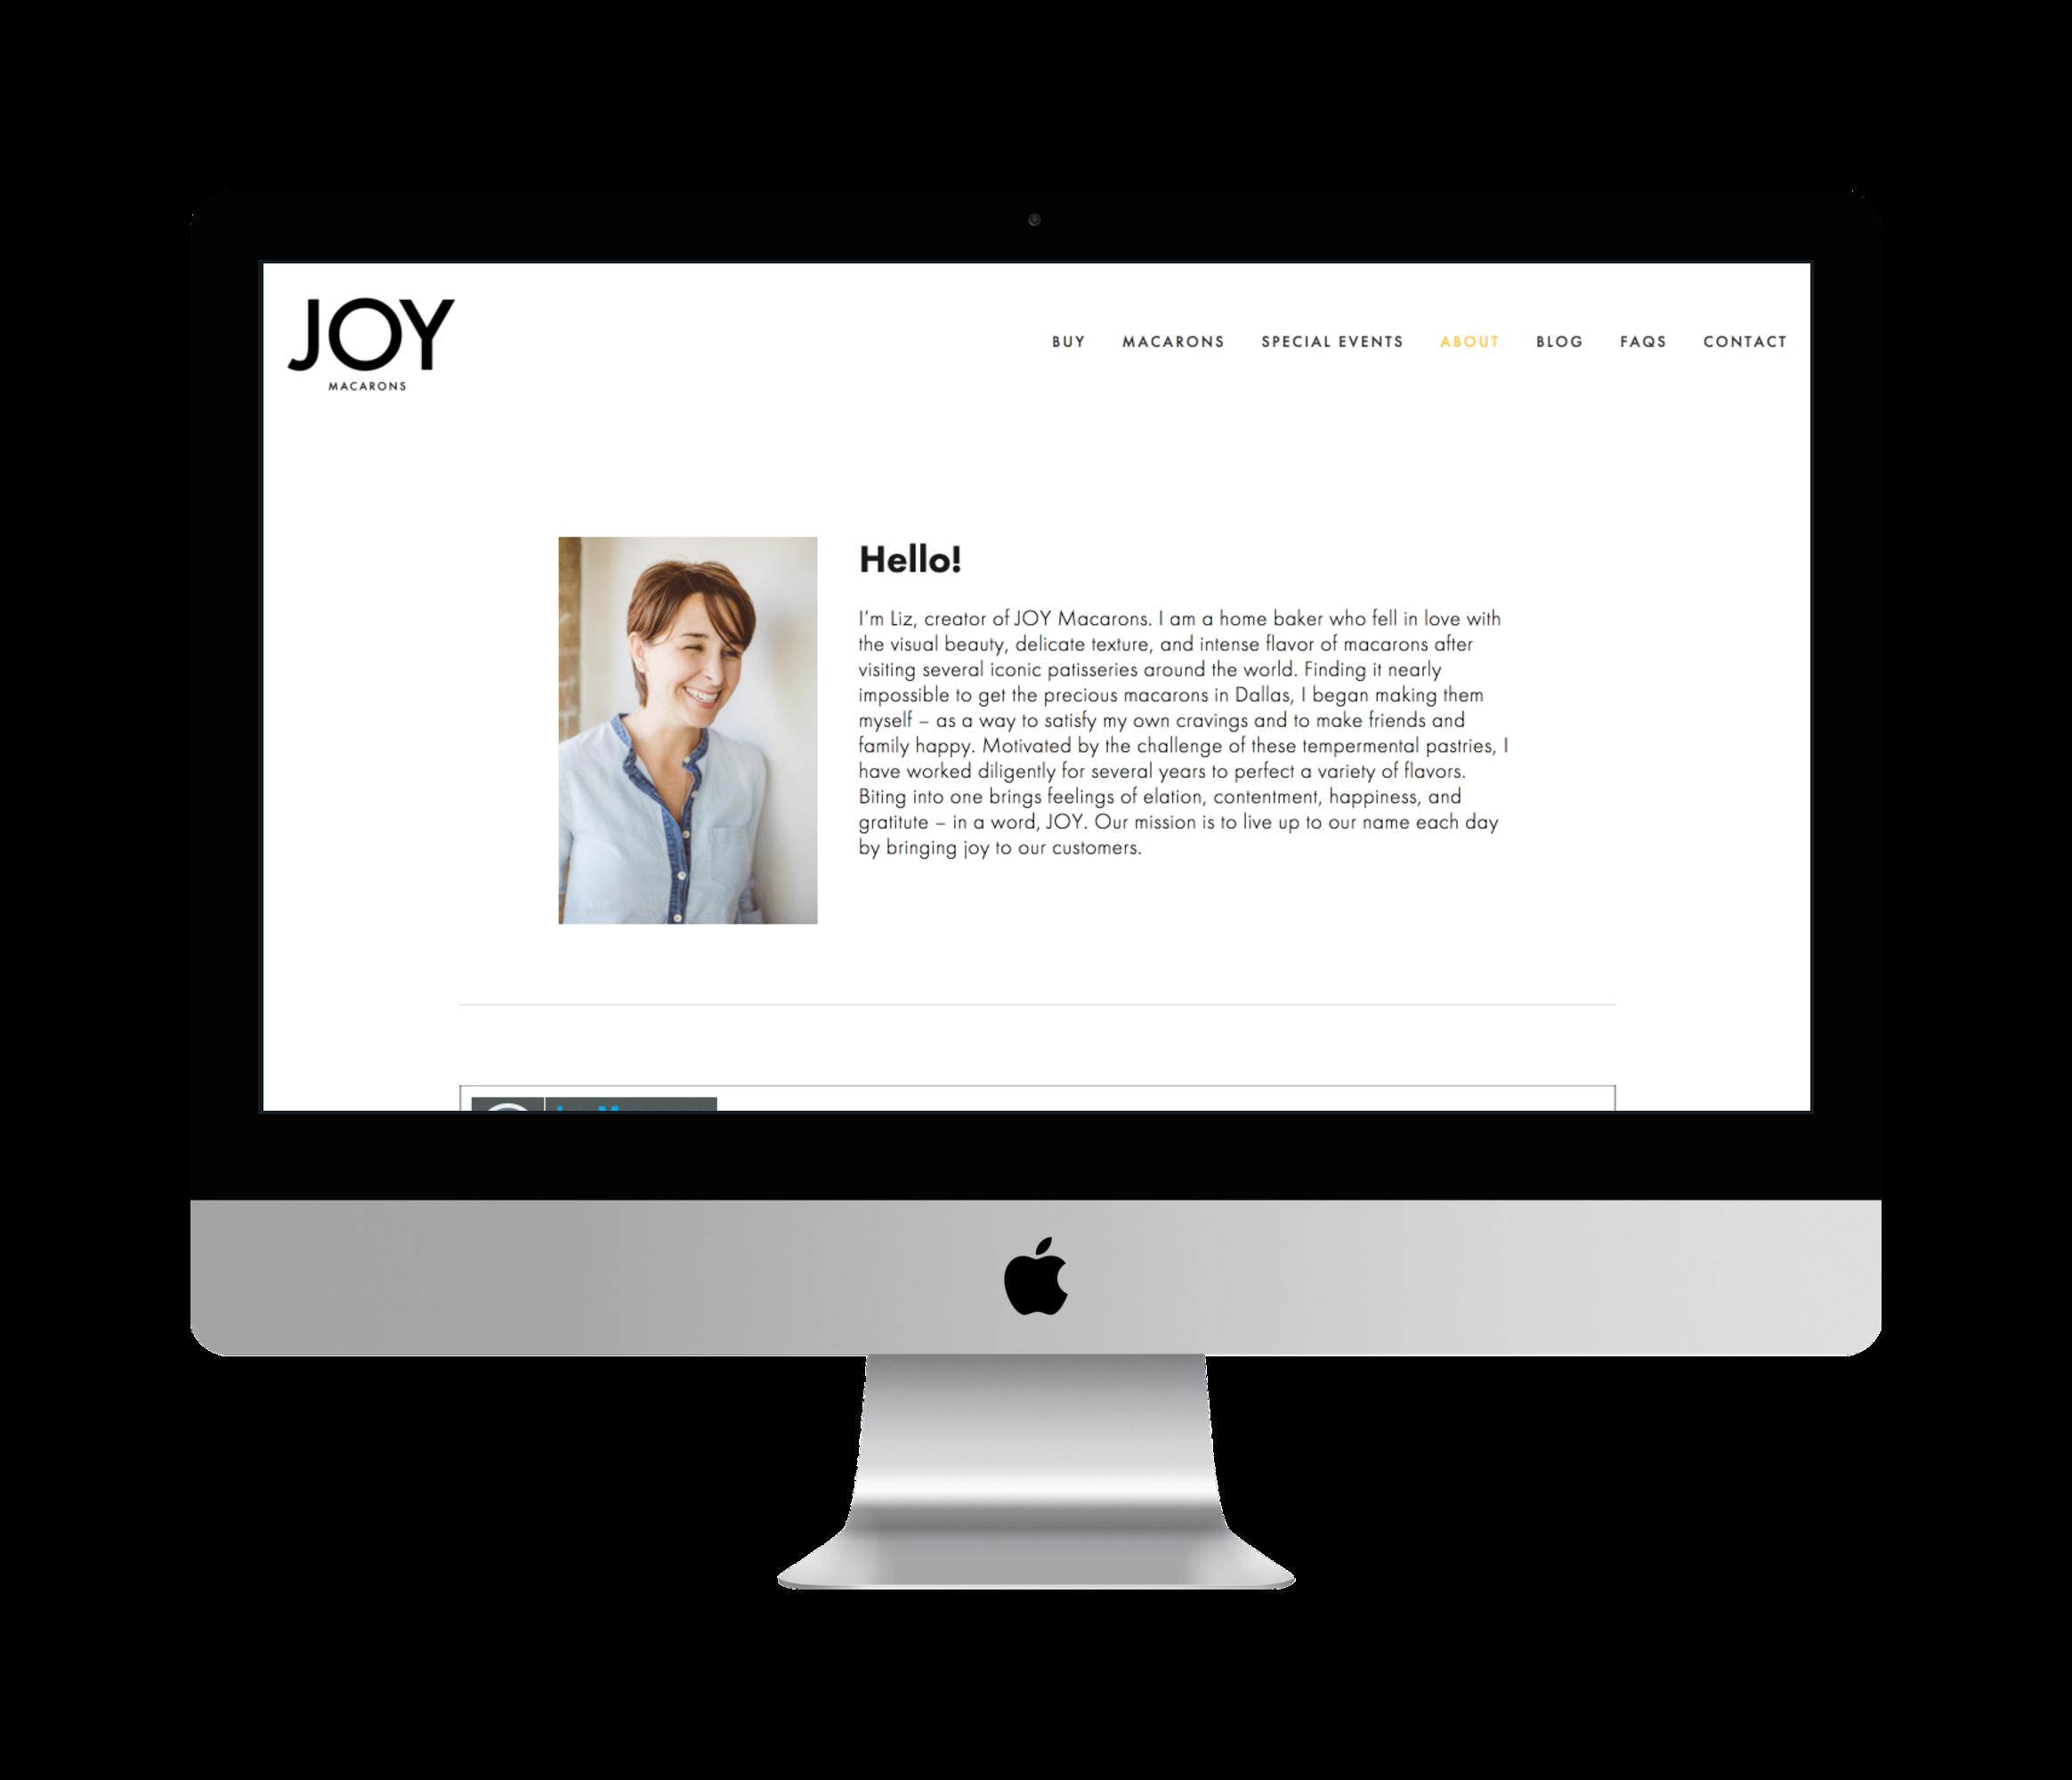 screenshot-www.joymacarons.com 2017-08-09 11-38-57-iMac.png